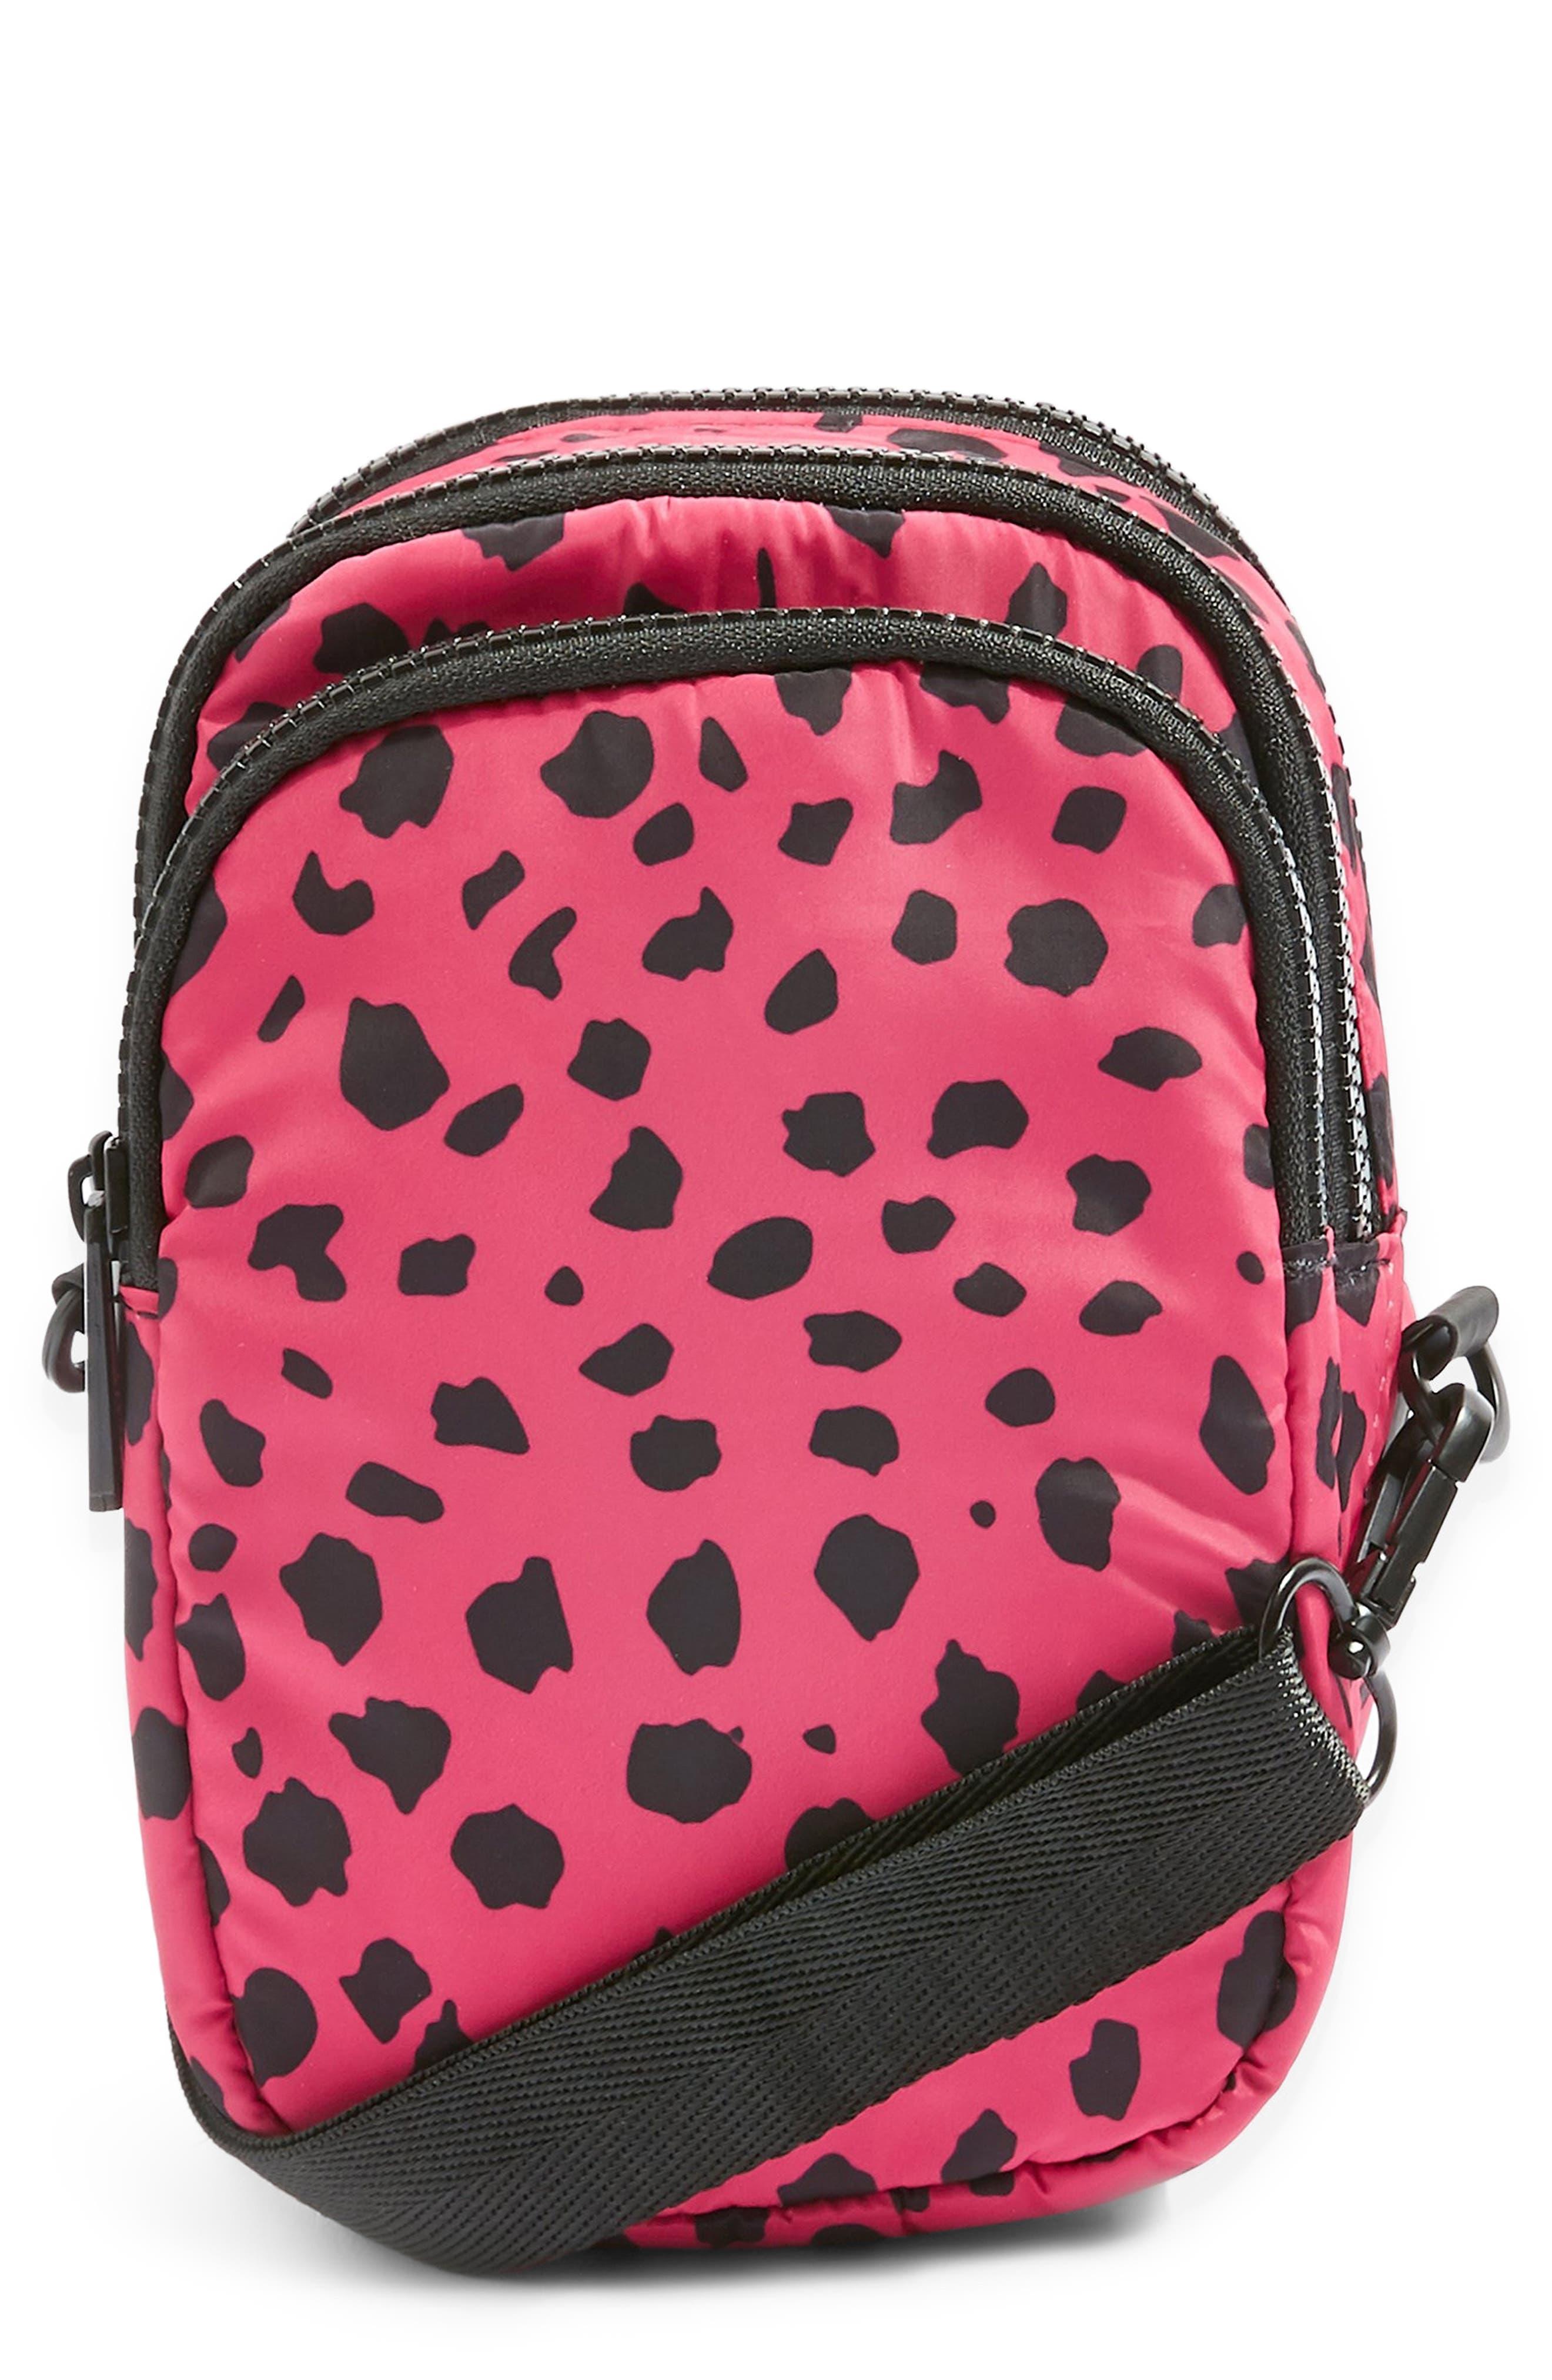 Leopard Print Nylon Shoulder Bag,                         Main,                         color, 650